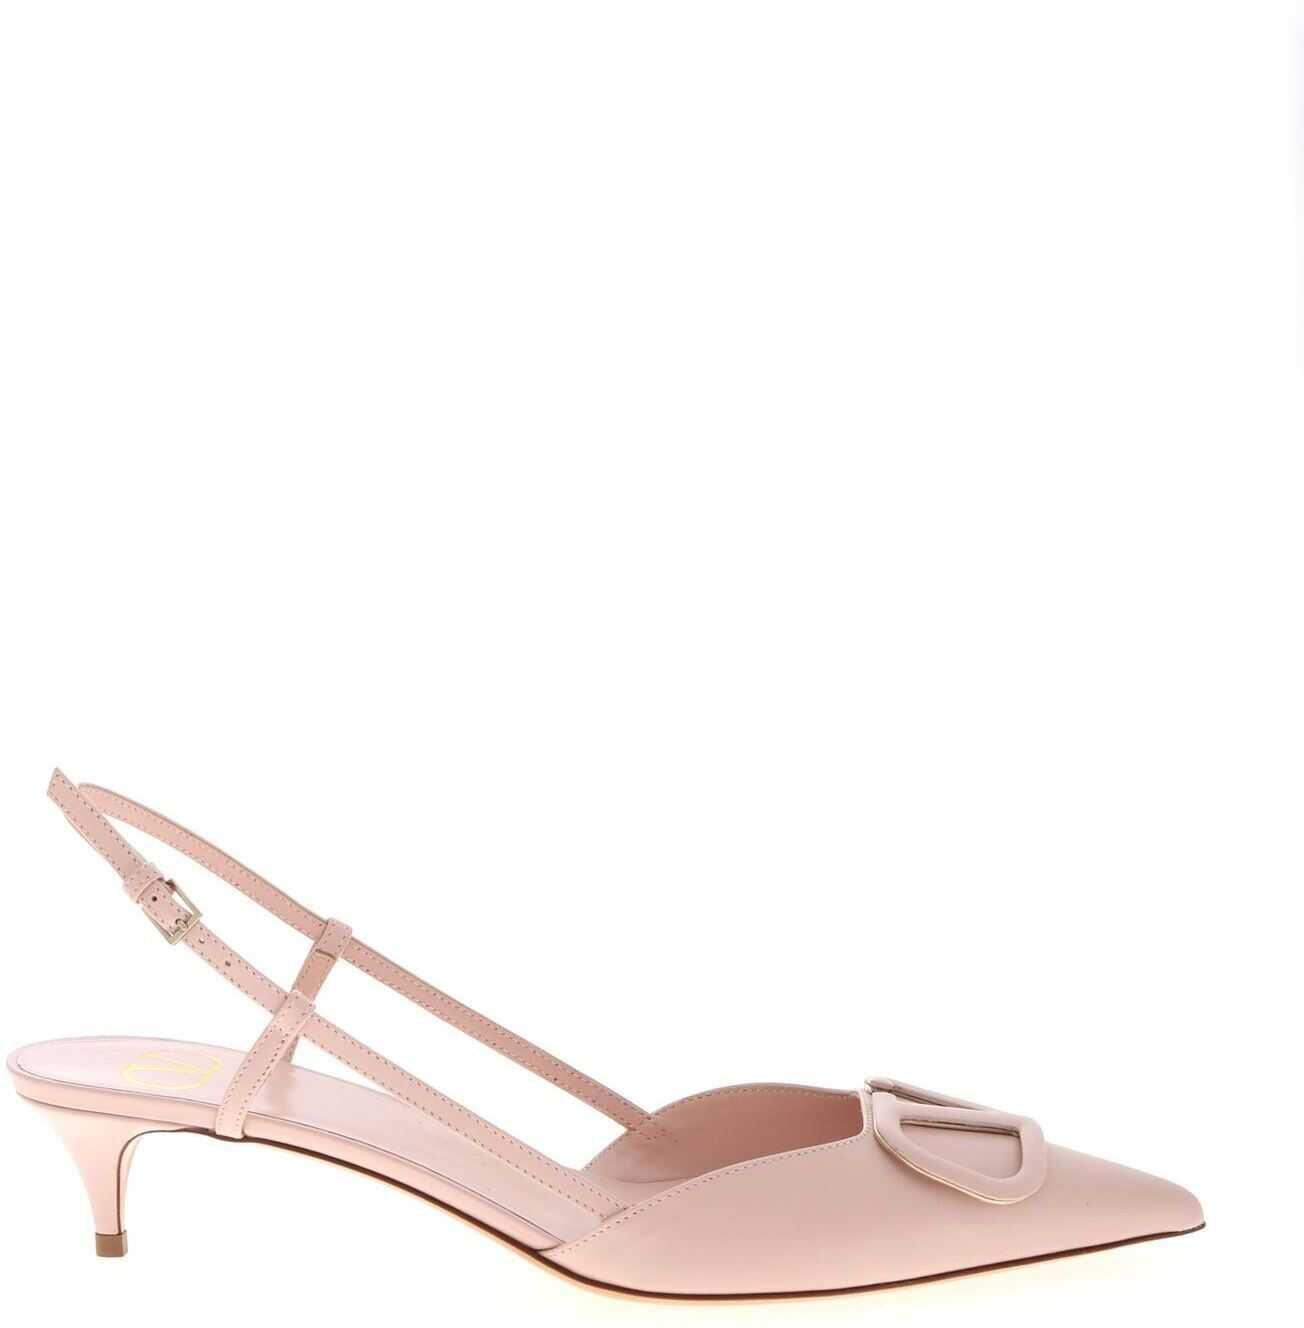 Valentino Garavani Sling Back V Logo In Pink TW2S0Q70 MZF 16Q Pink imagine b-mall.ro